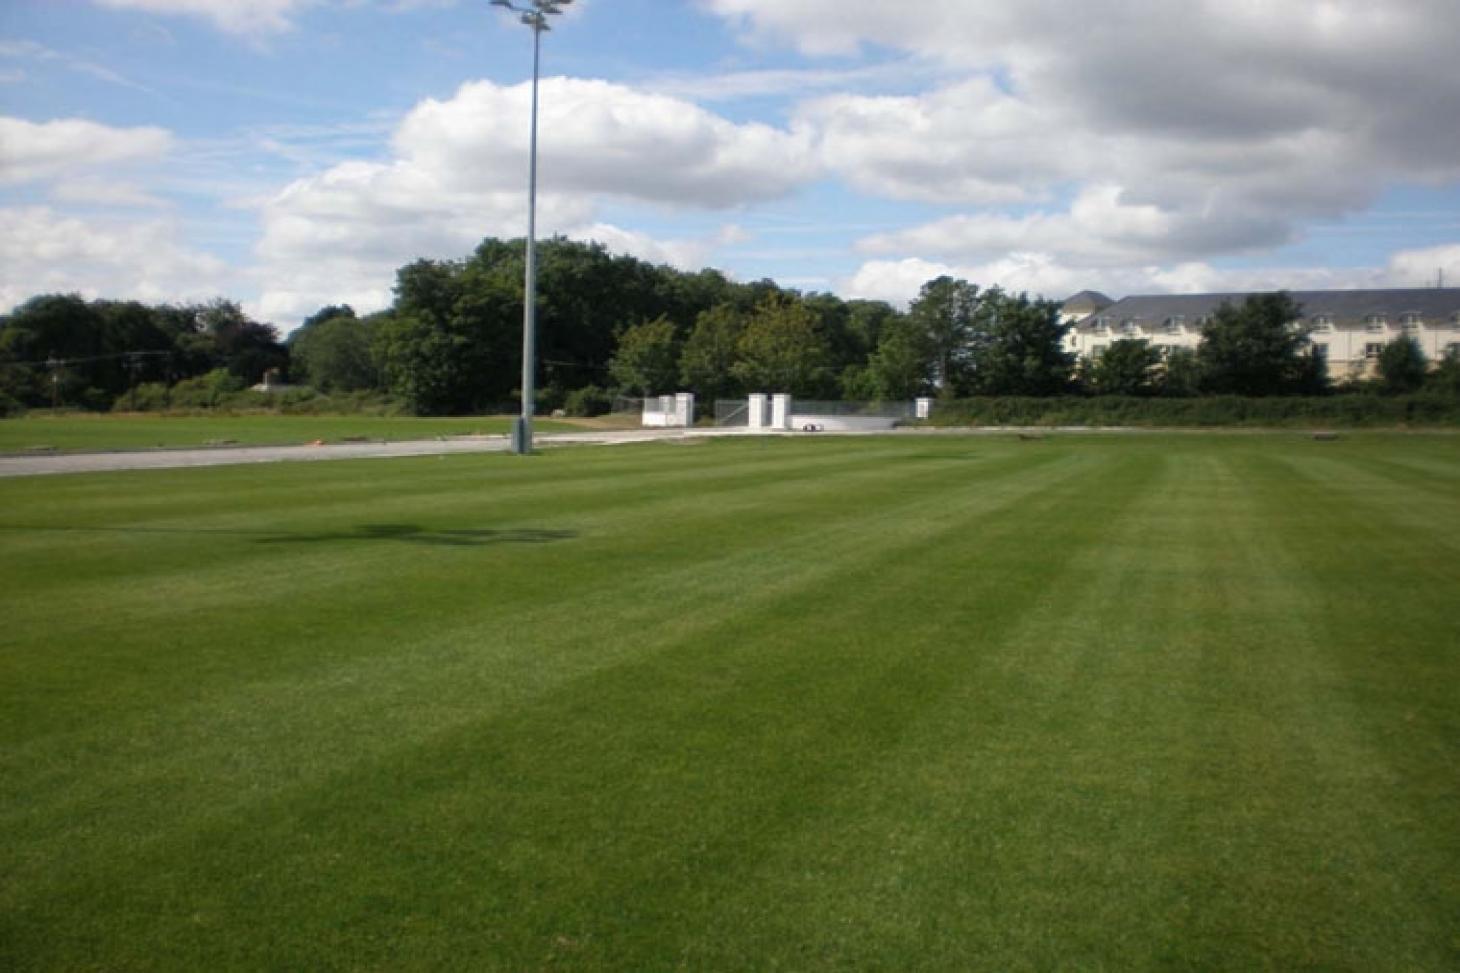 Castleknock GAA Club Training   Astroturf gaa pitch